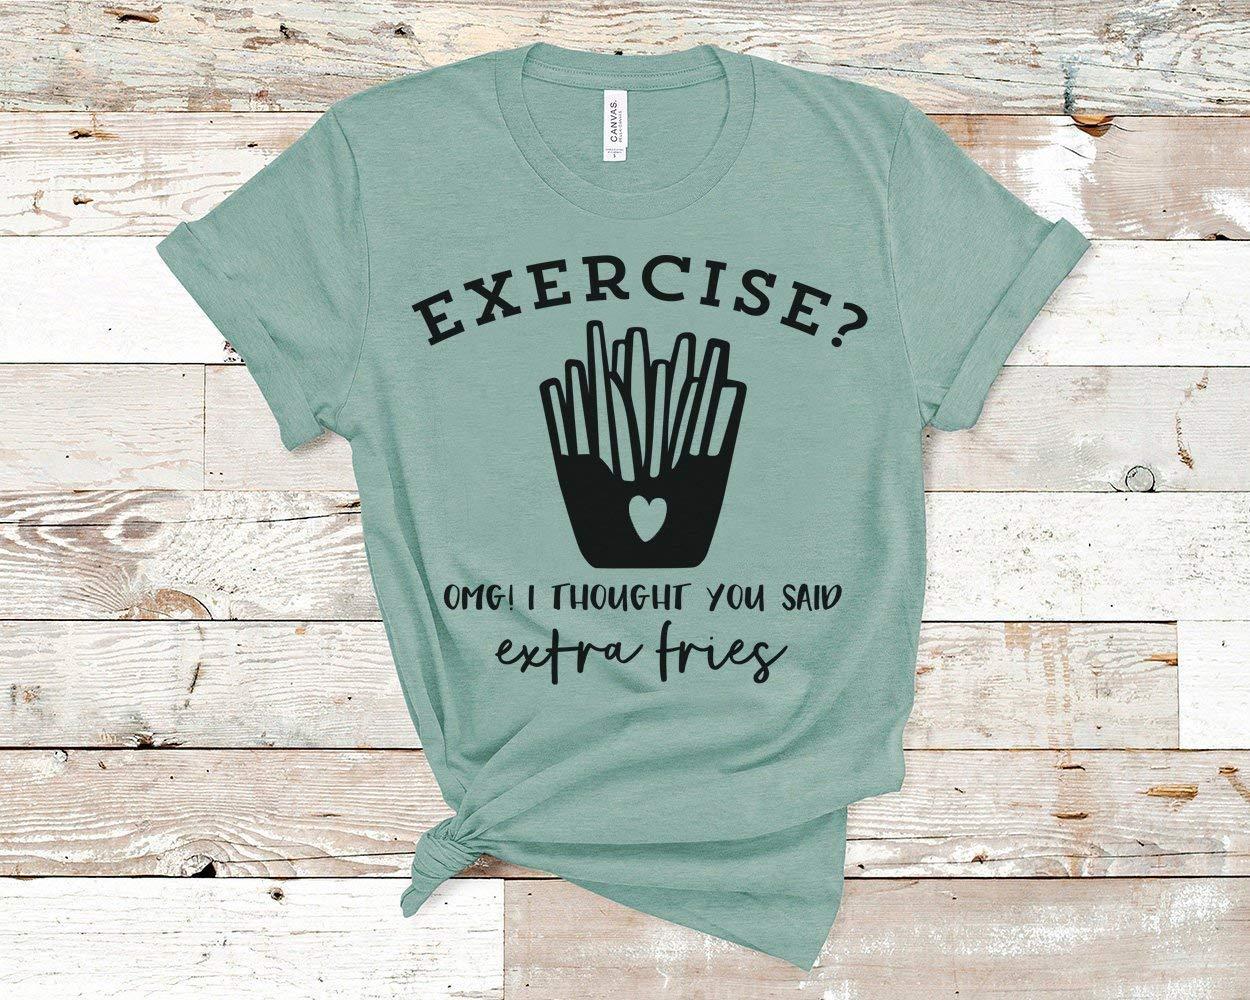 Amazon Com Exercise I Thought You Said Extra Fries Workout Shirt Gym Shirt Yoga T Shirt Shirts With Sayings Women S Shirt Food Funny Tee Handmade